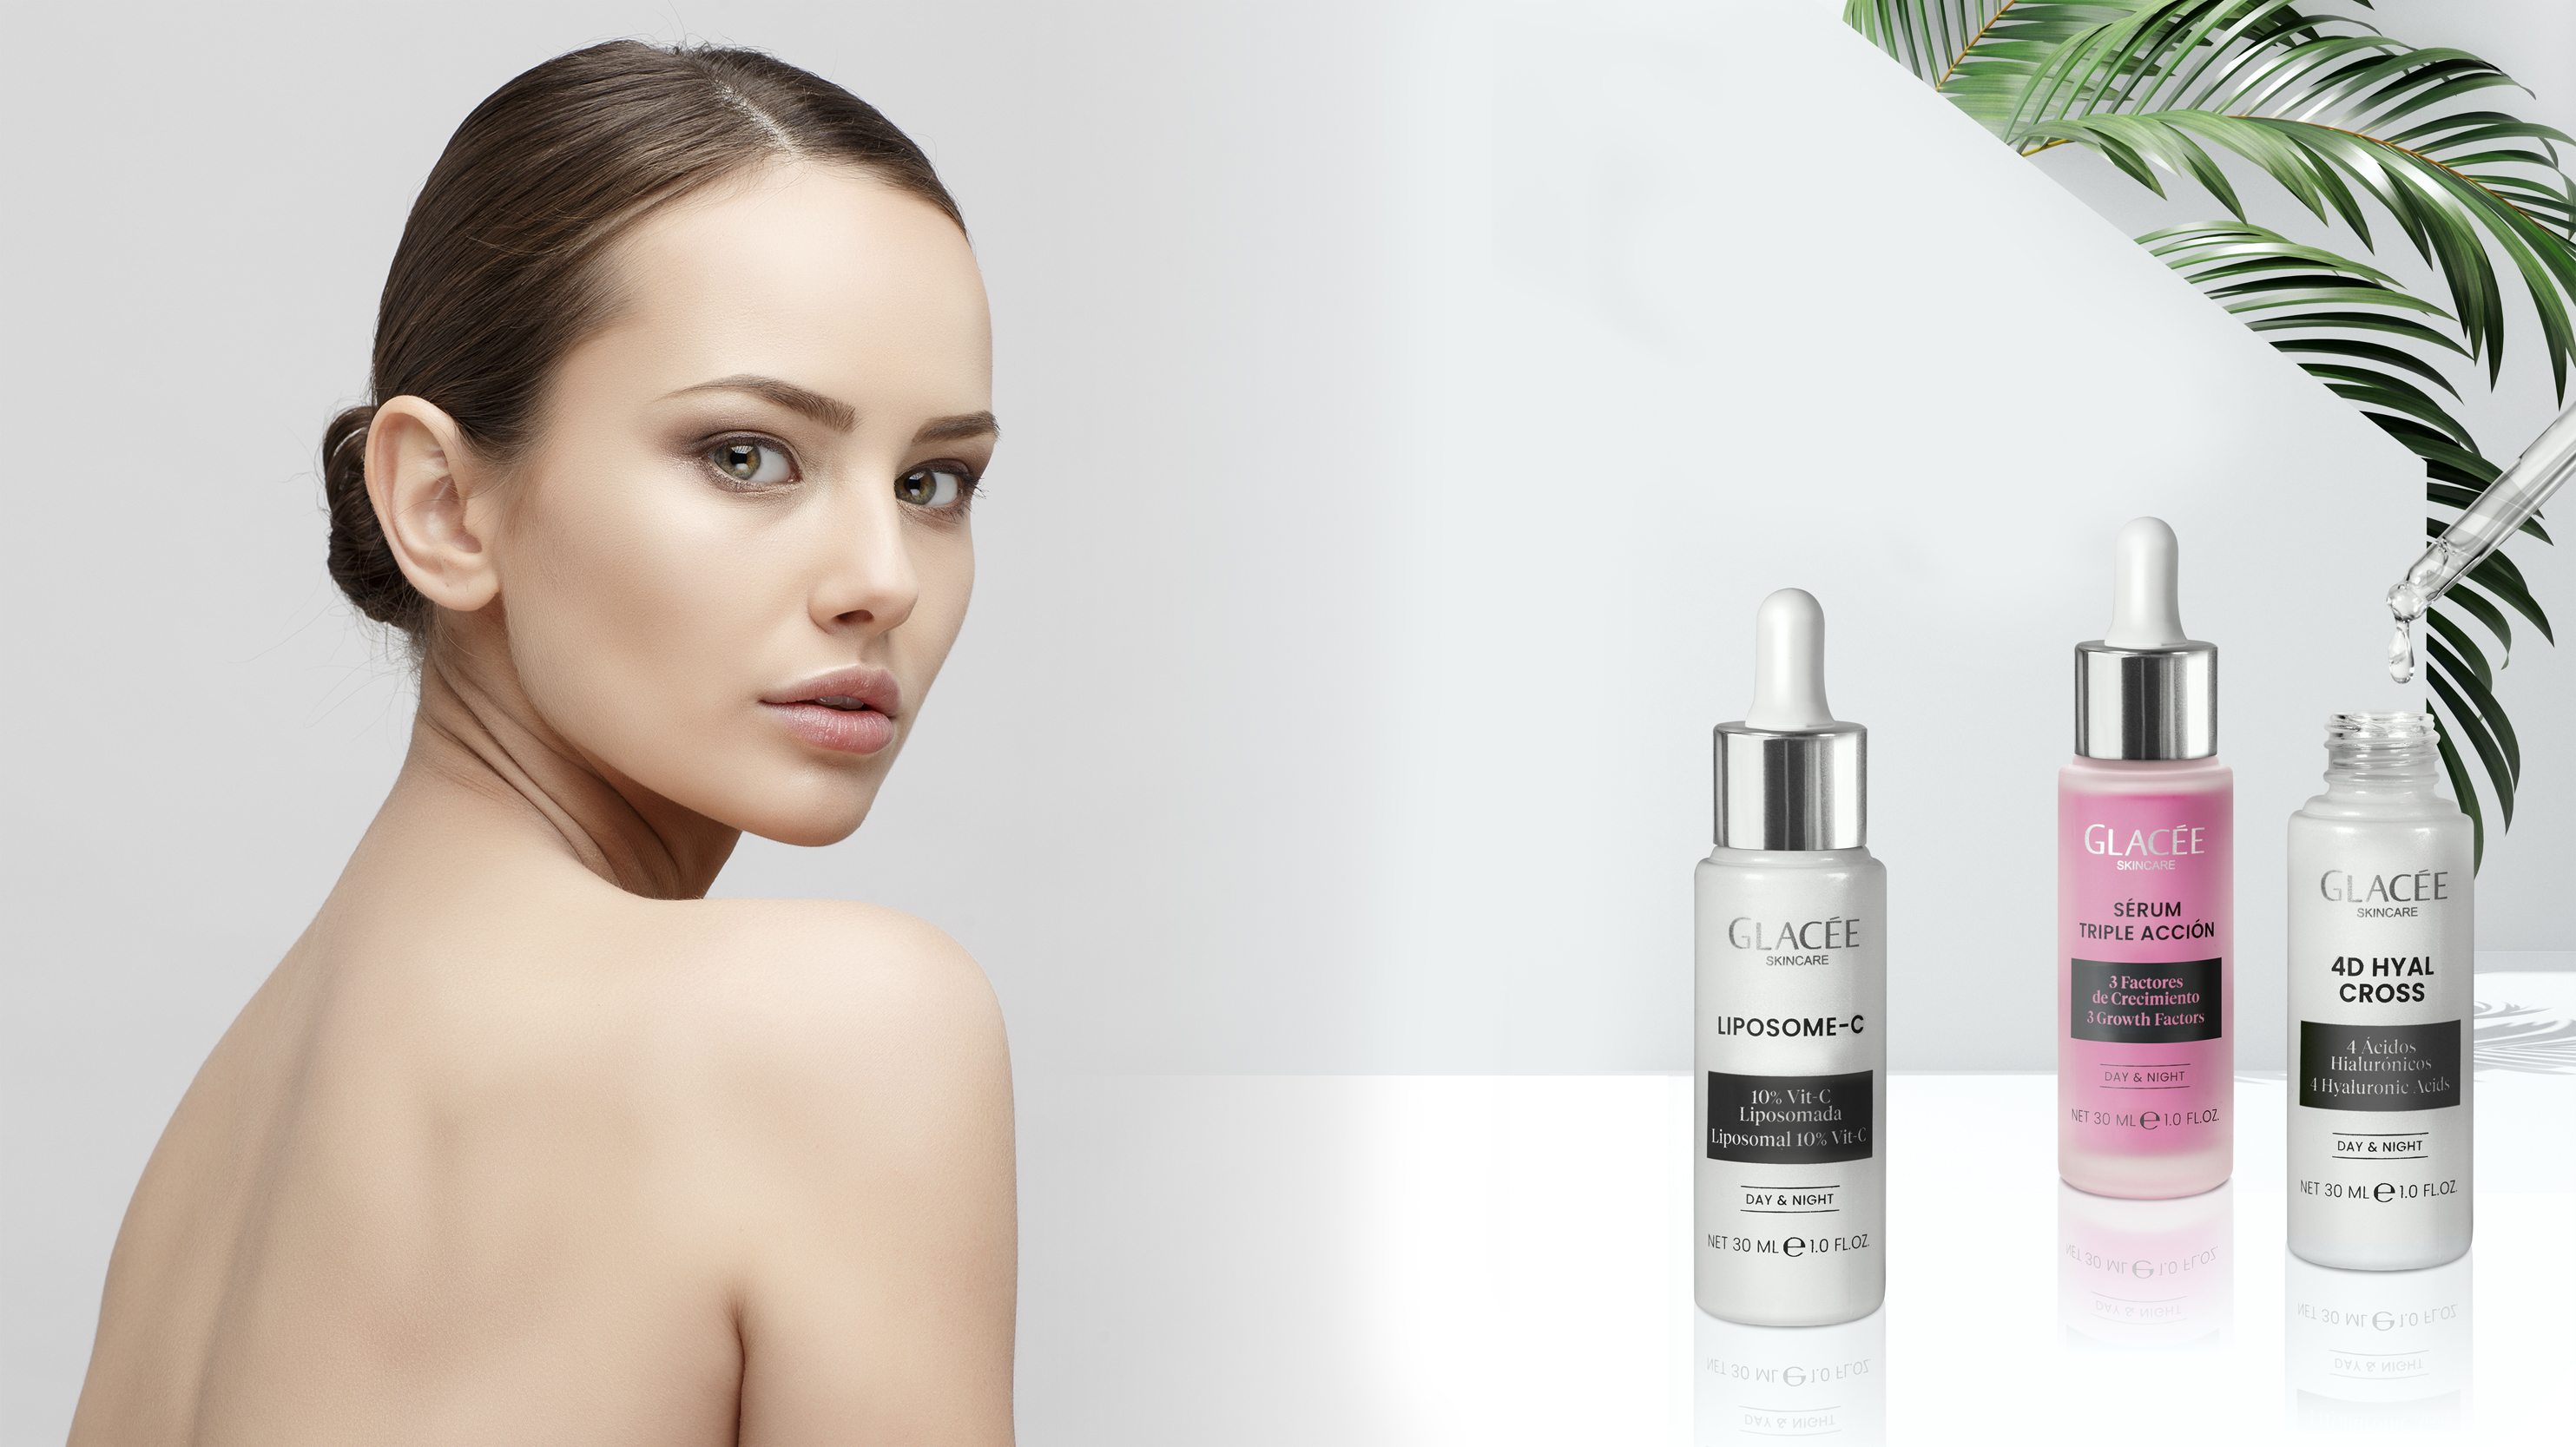 Glacee Skincare nuevos lanzamientos